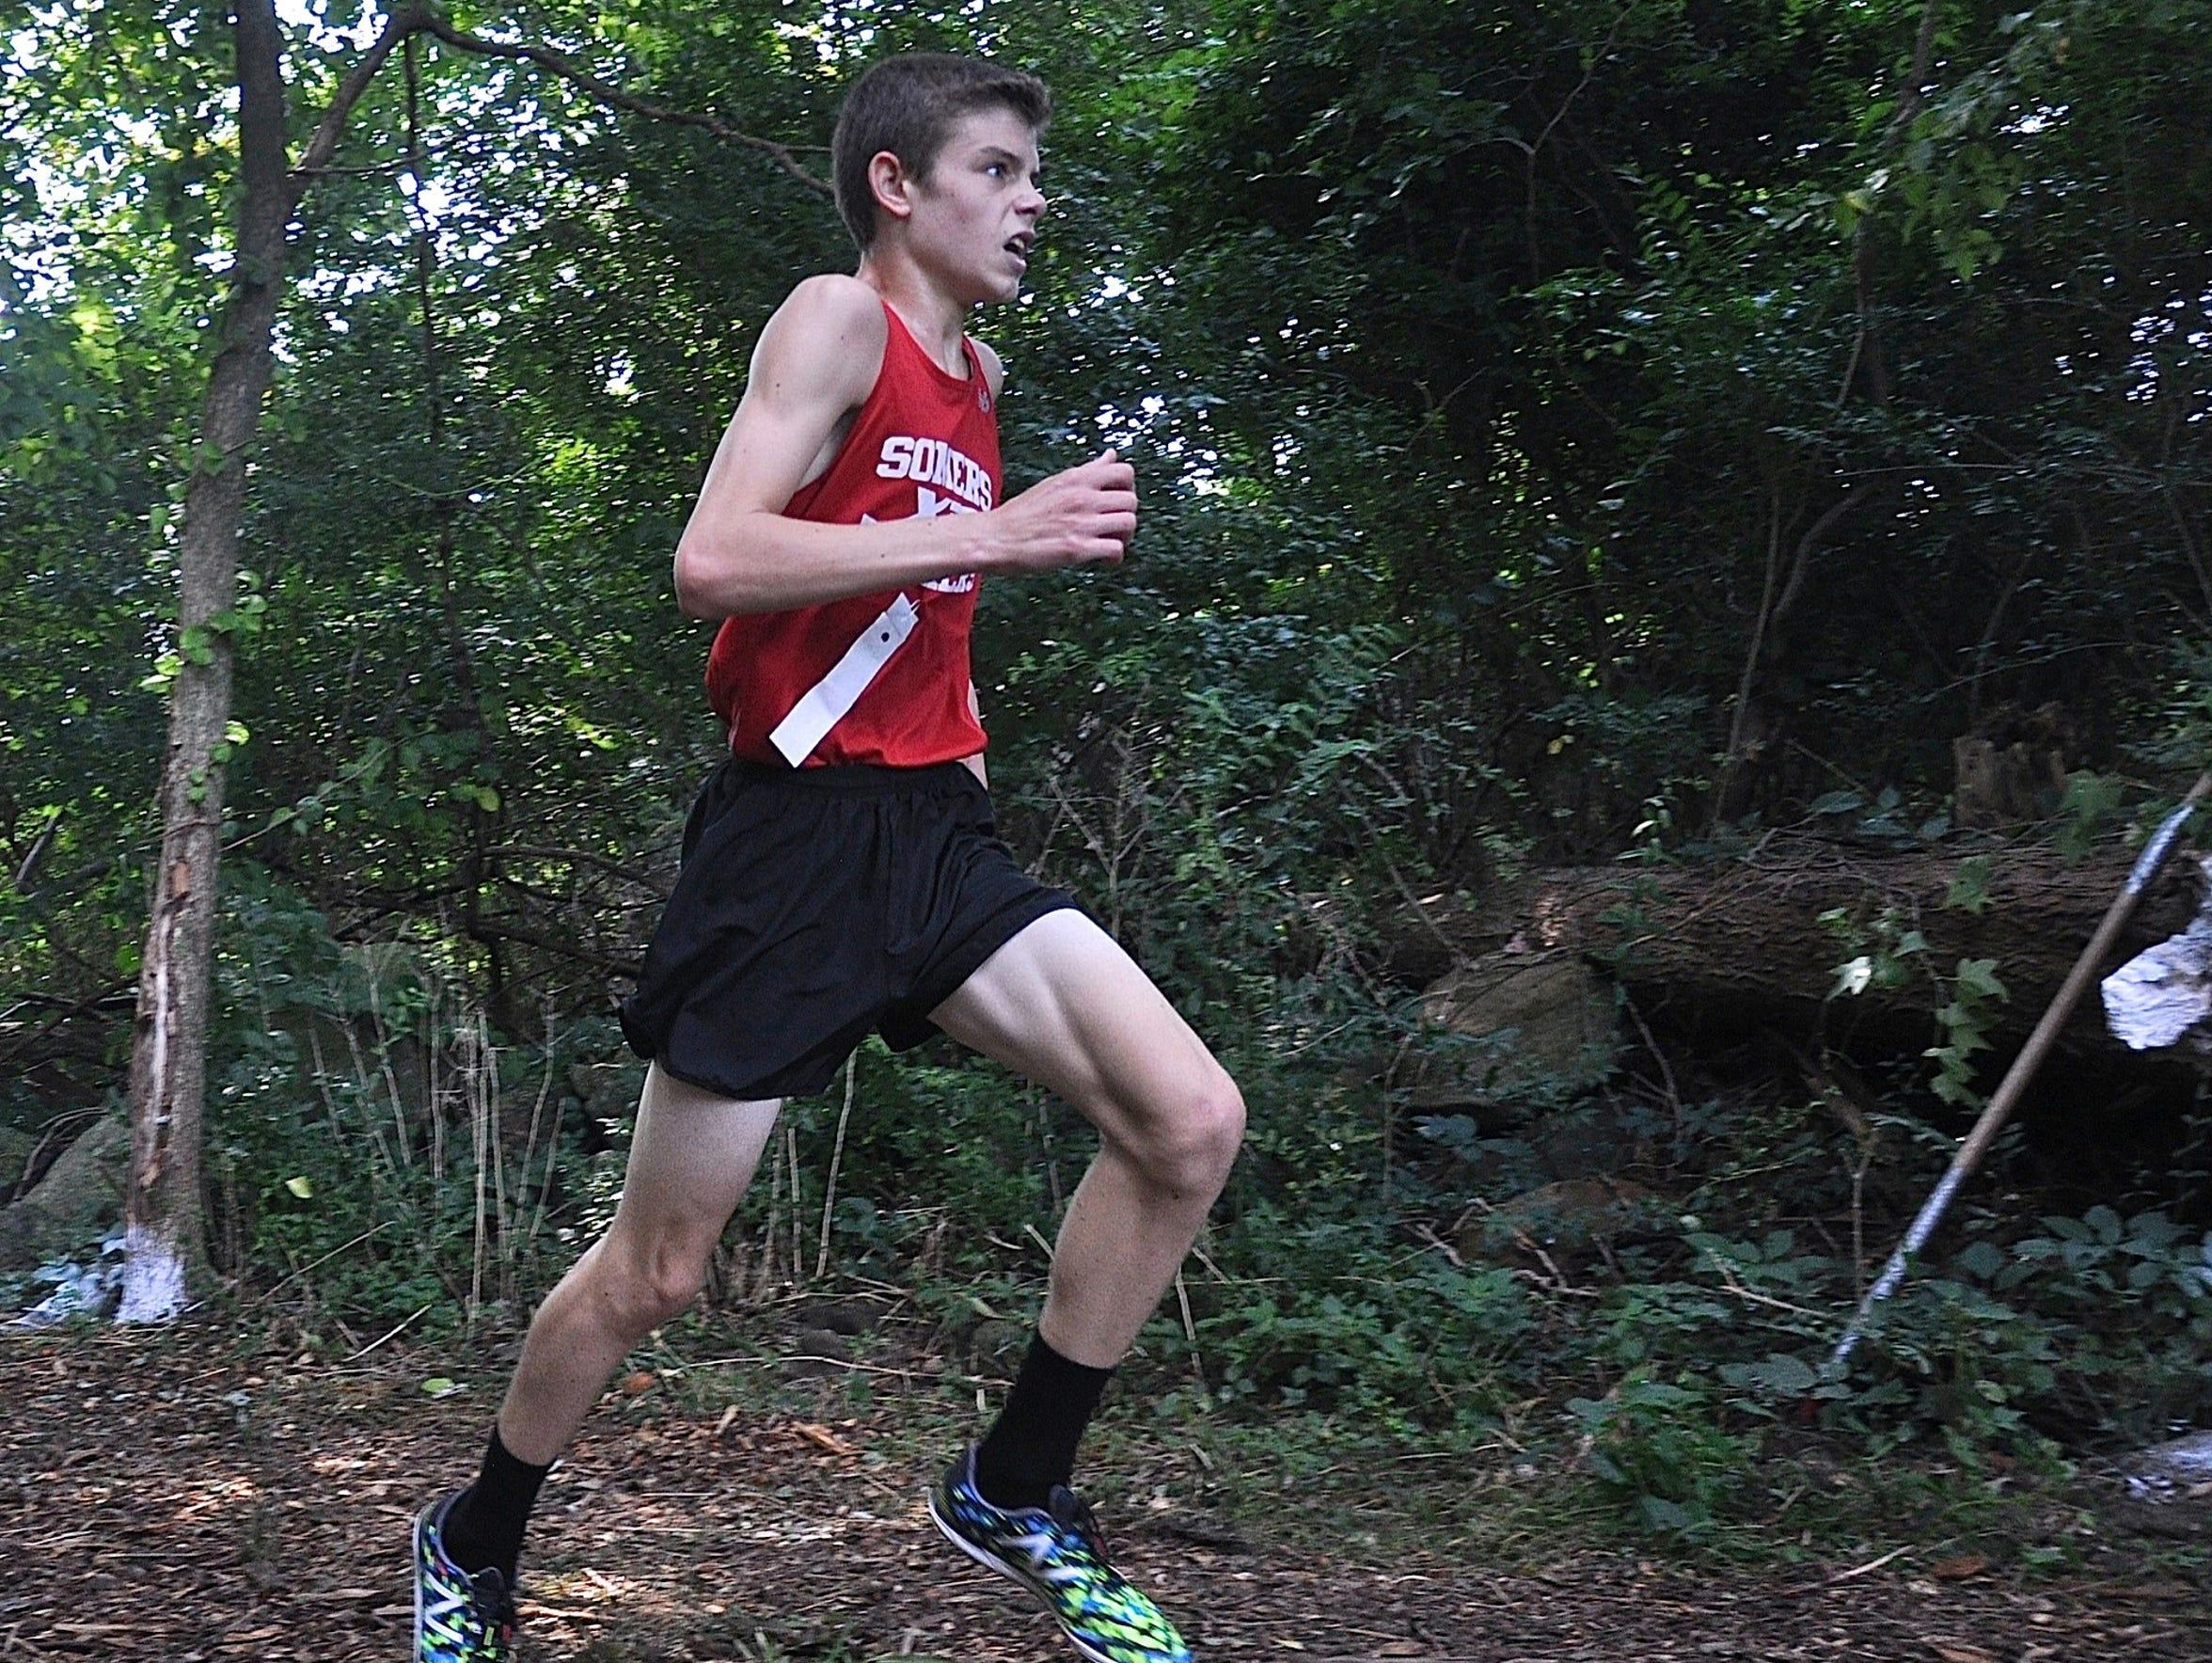 Matt Fusco of Somers en route to winning the 2016 Somers